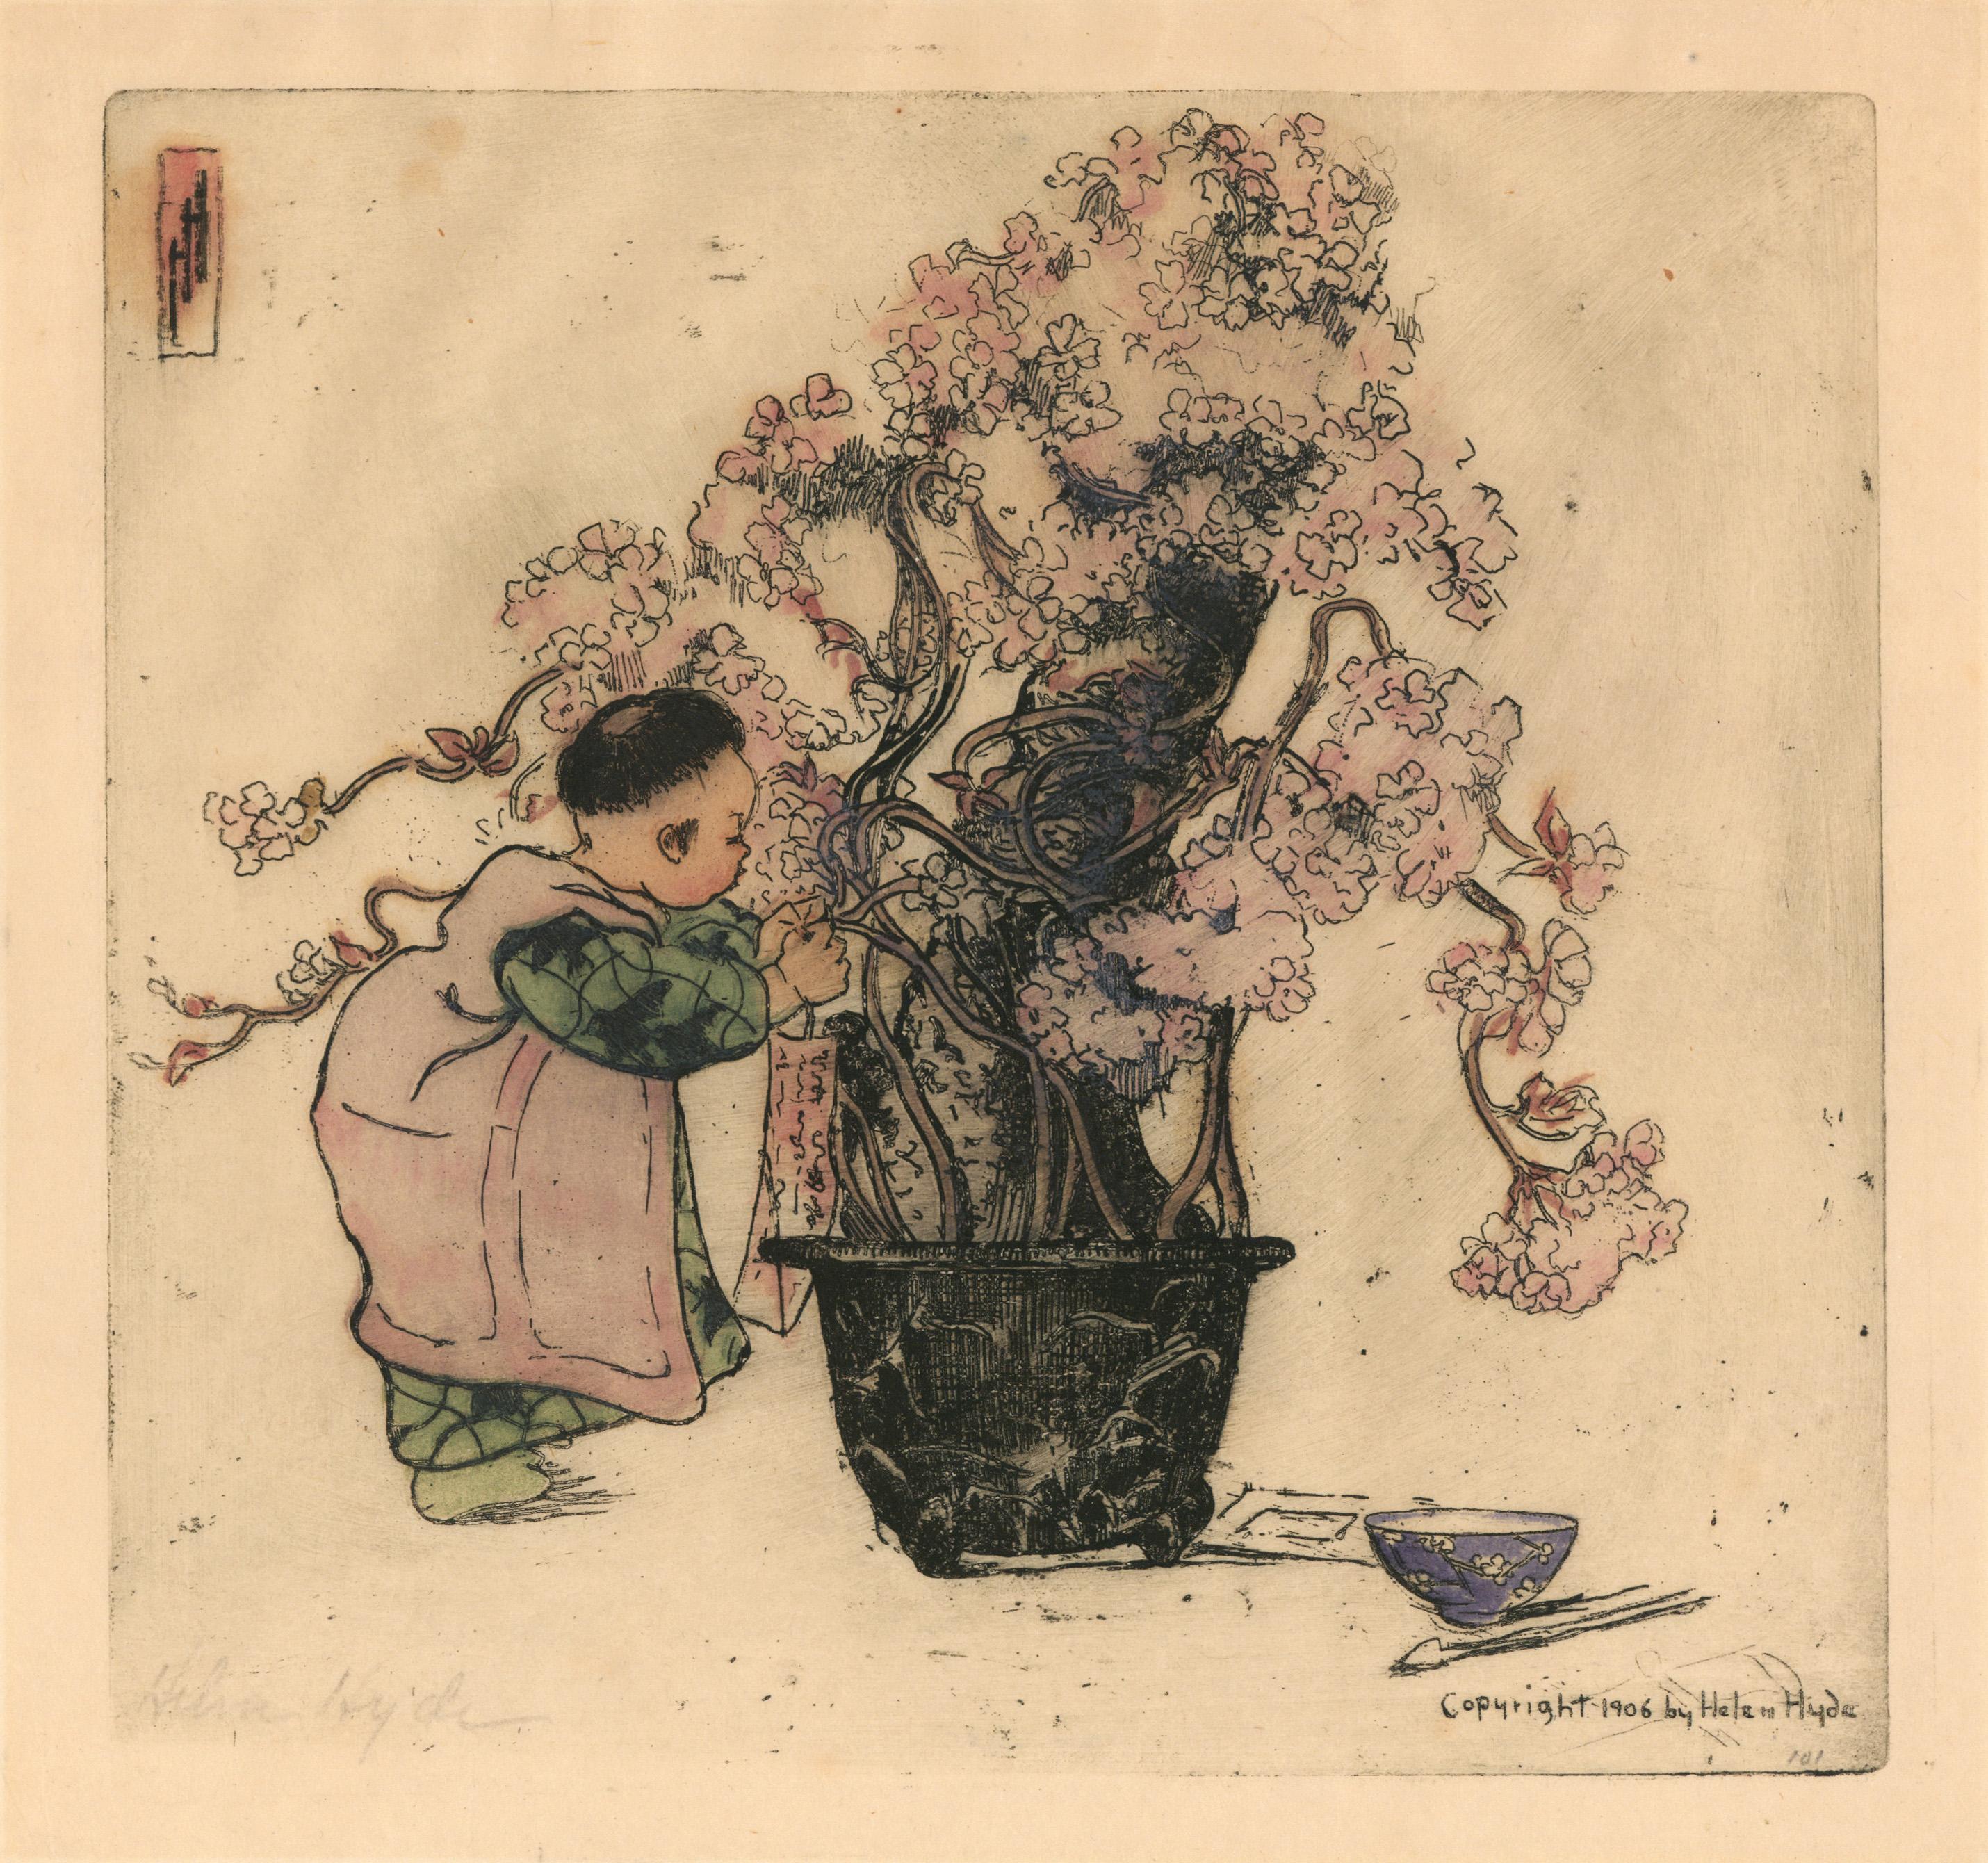 Spring Poem by Helen Hyde 1906